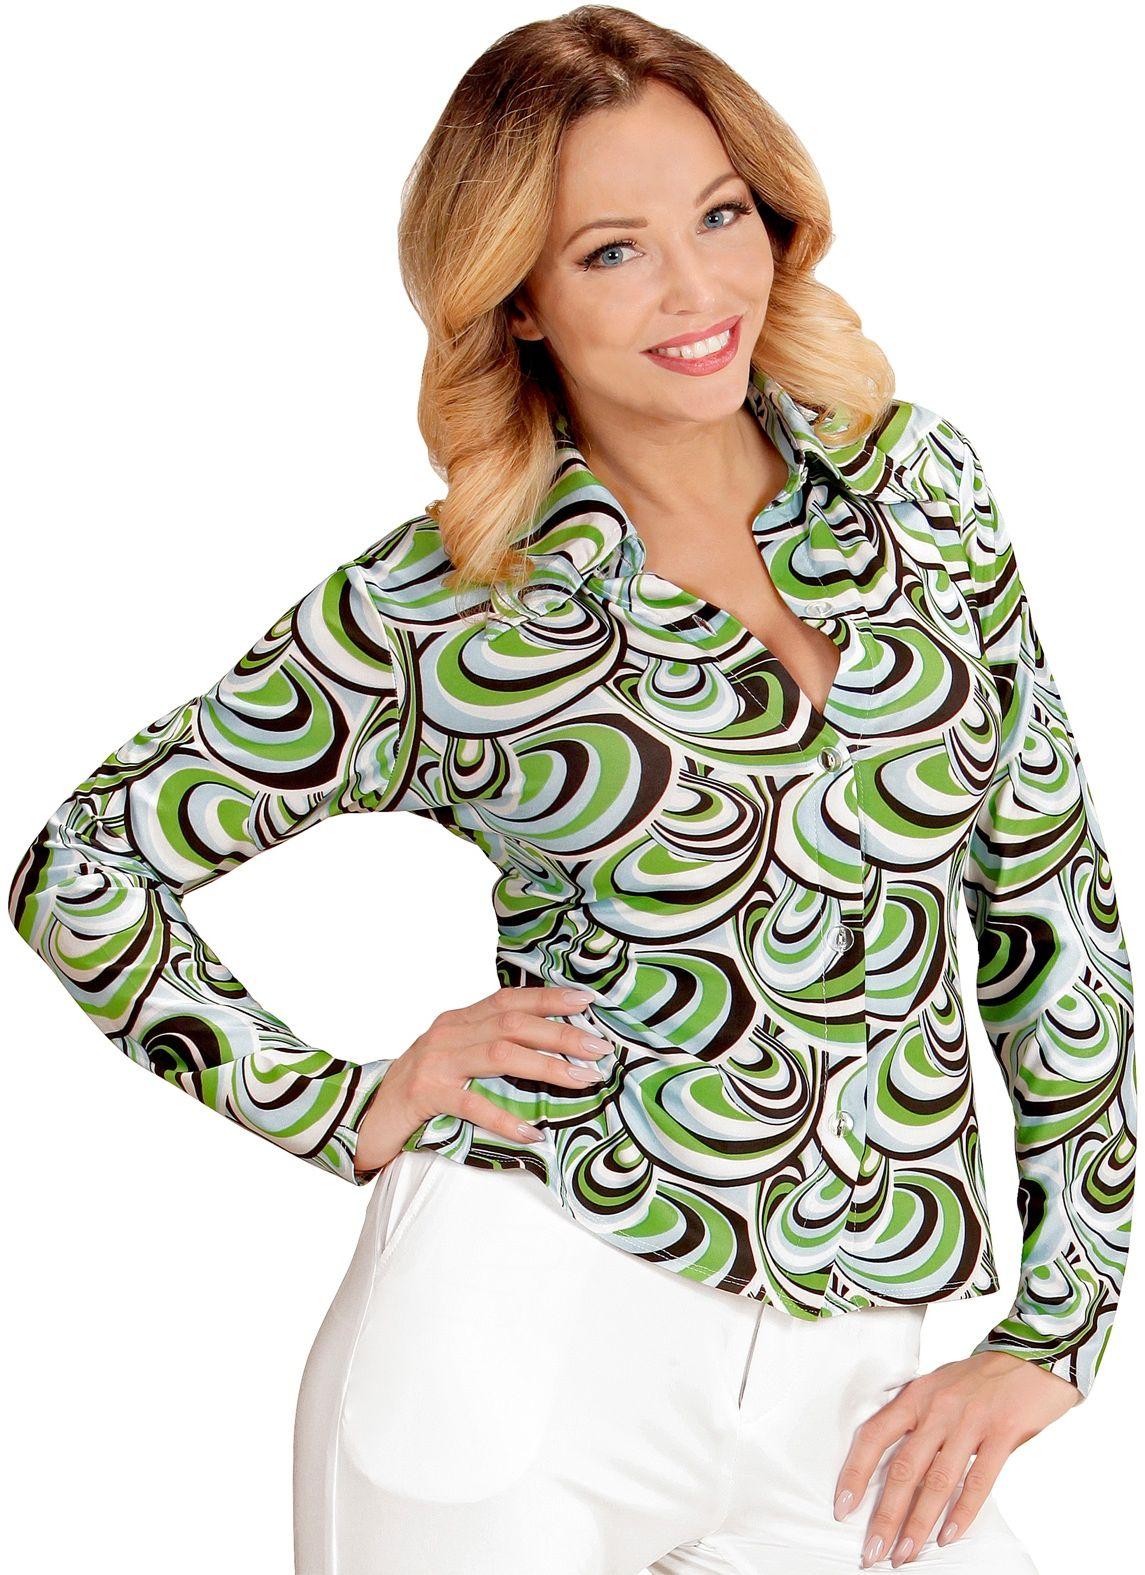 70s groovy shirt dames